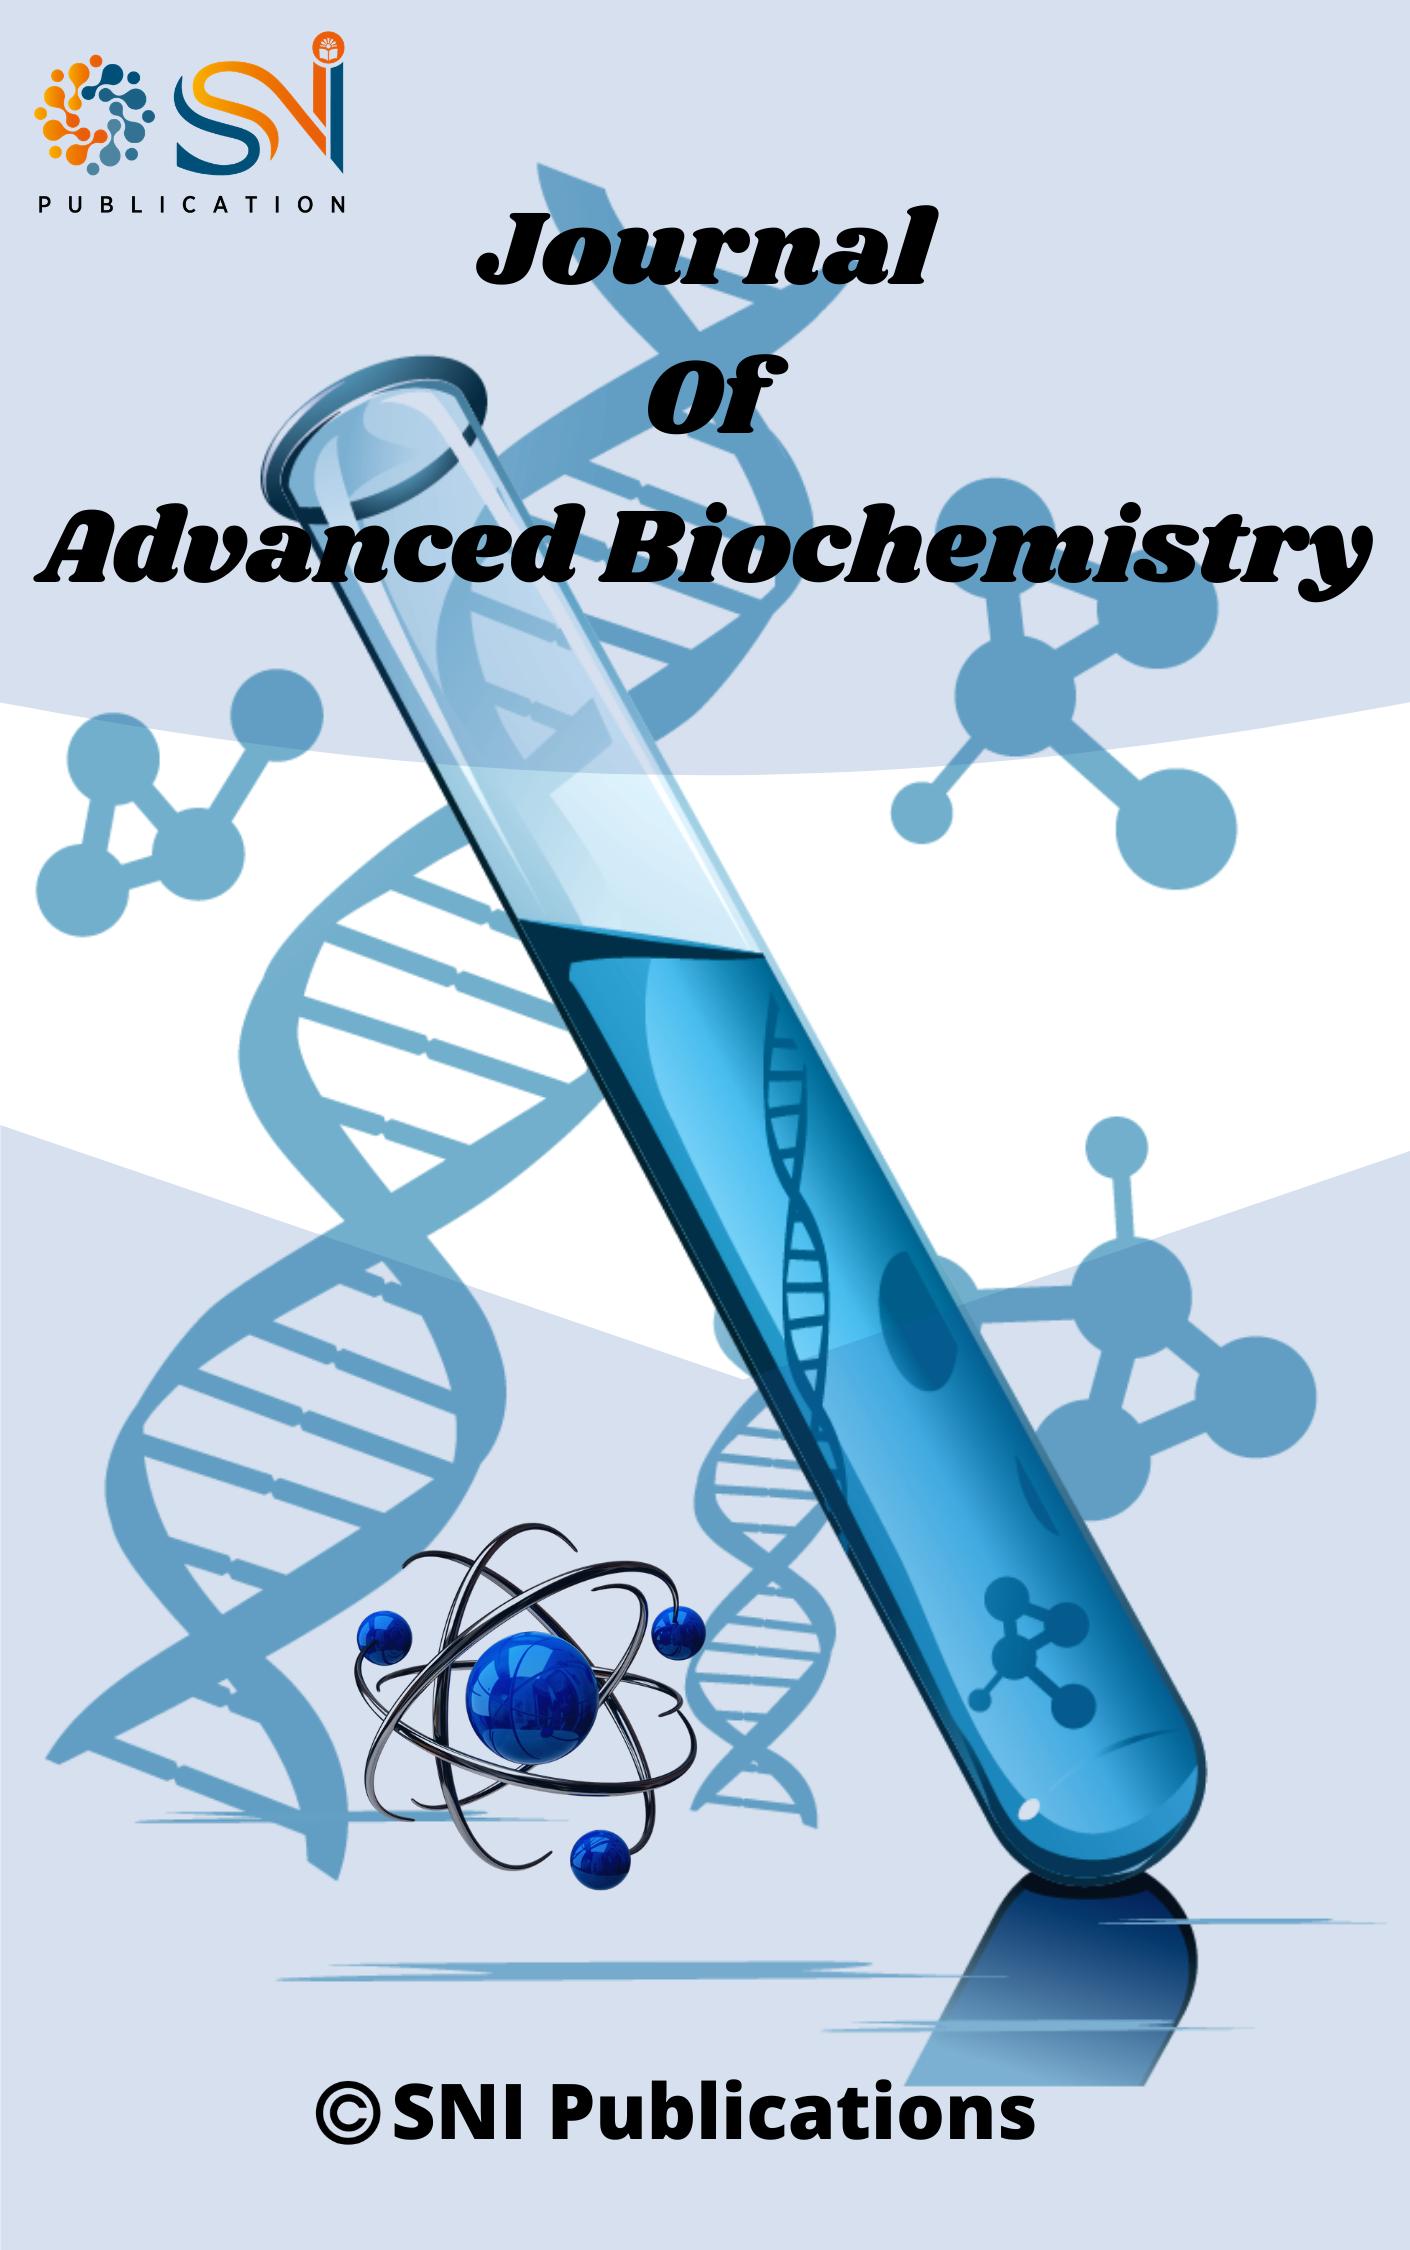 Journal of Advanced Biochemistry